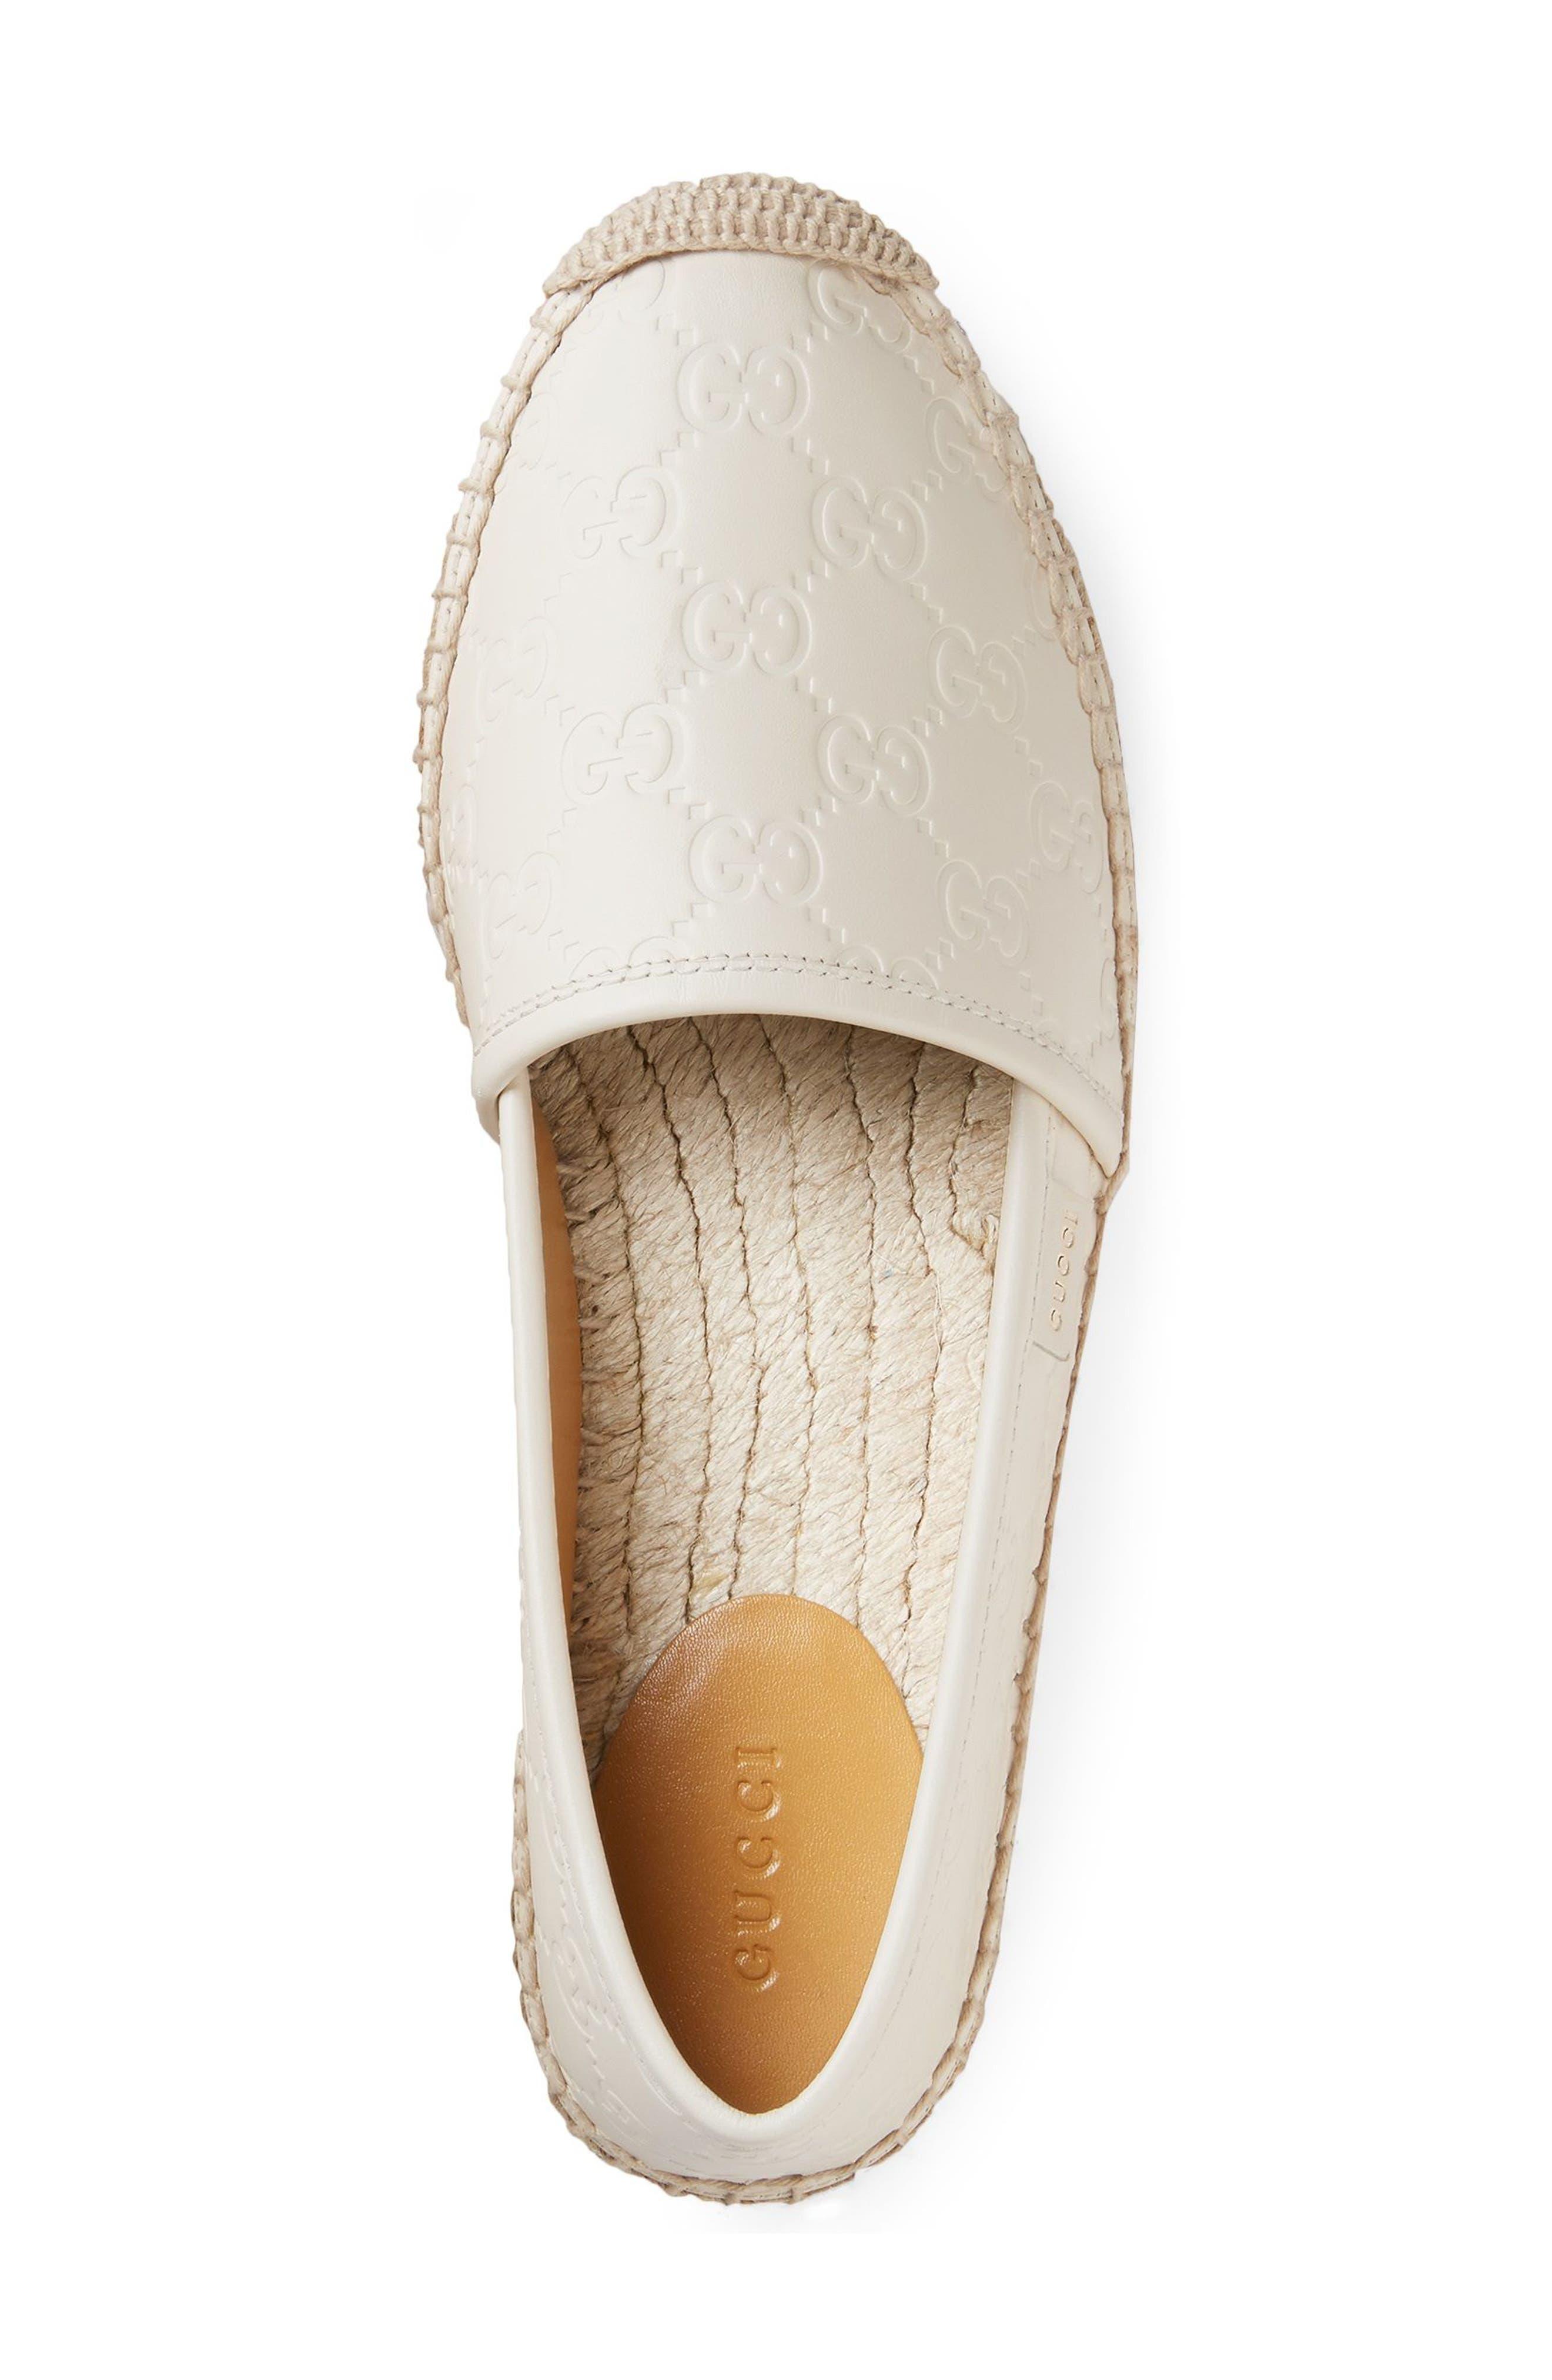 Pilar Espadrille Flat,                             Alternate thumbnail 2, color,                             White Leather